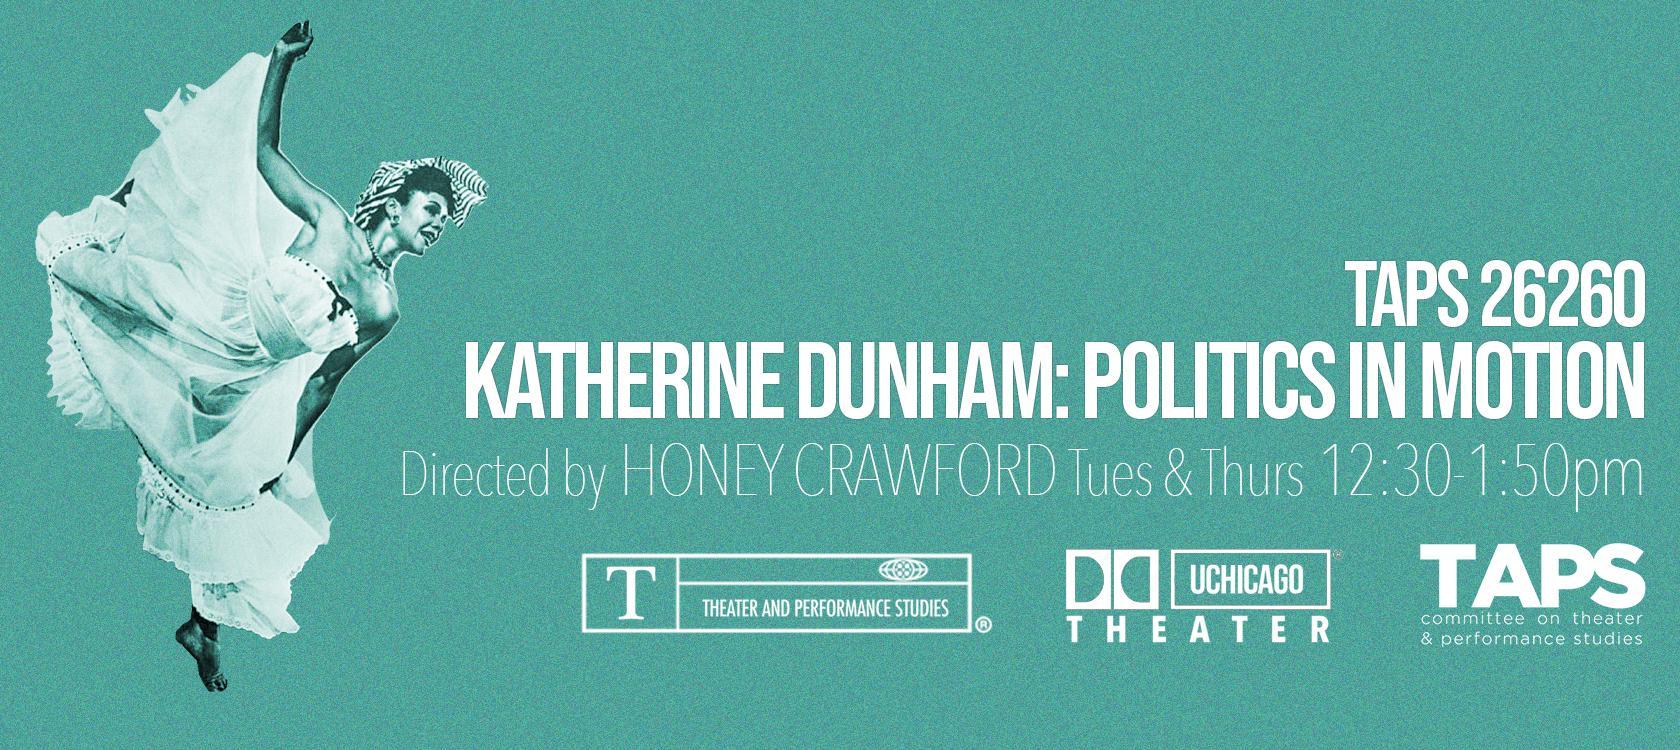 Katherine Dunham: Politics in Motion